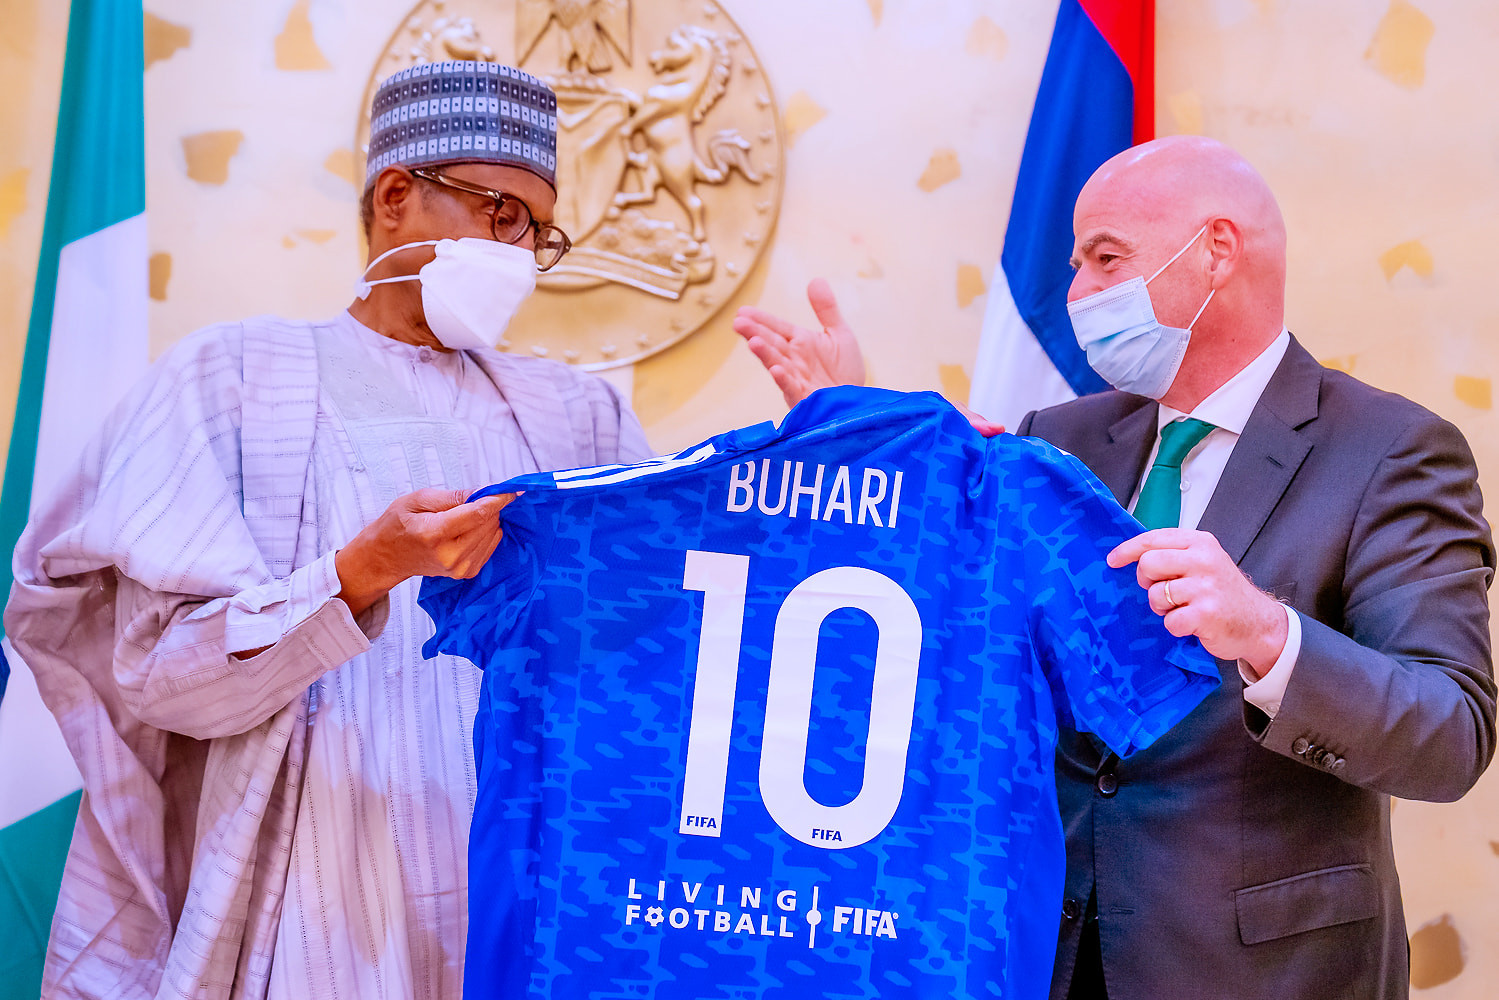 President Buhari meets FIFA President, gets No.10 Jersey (photos)